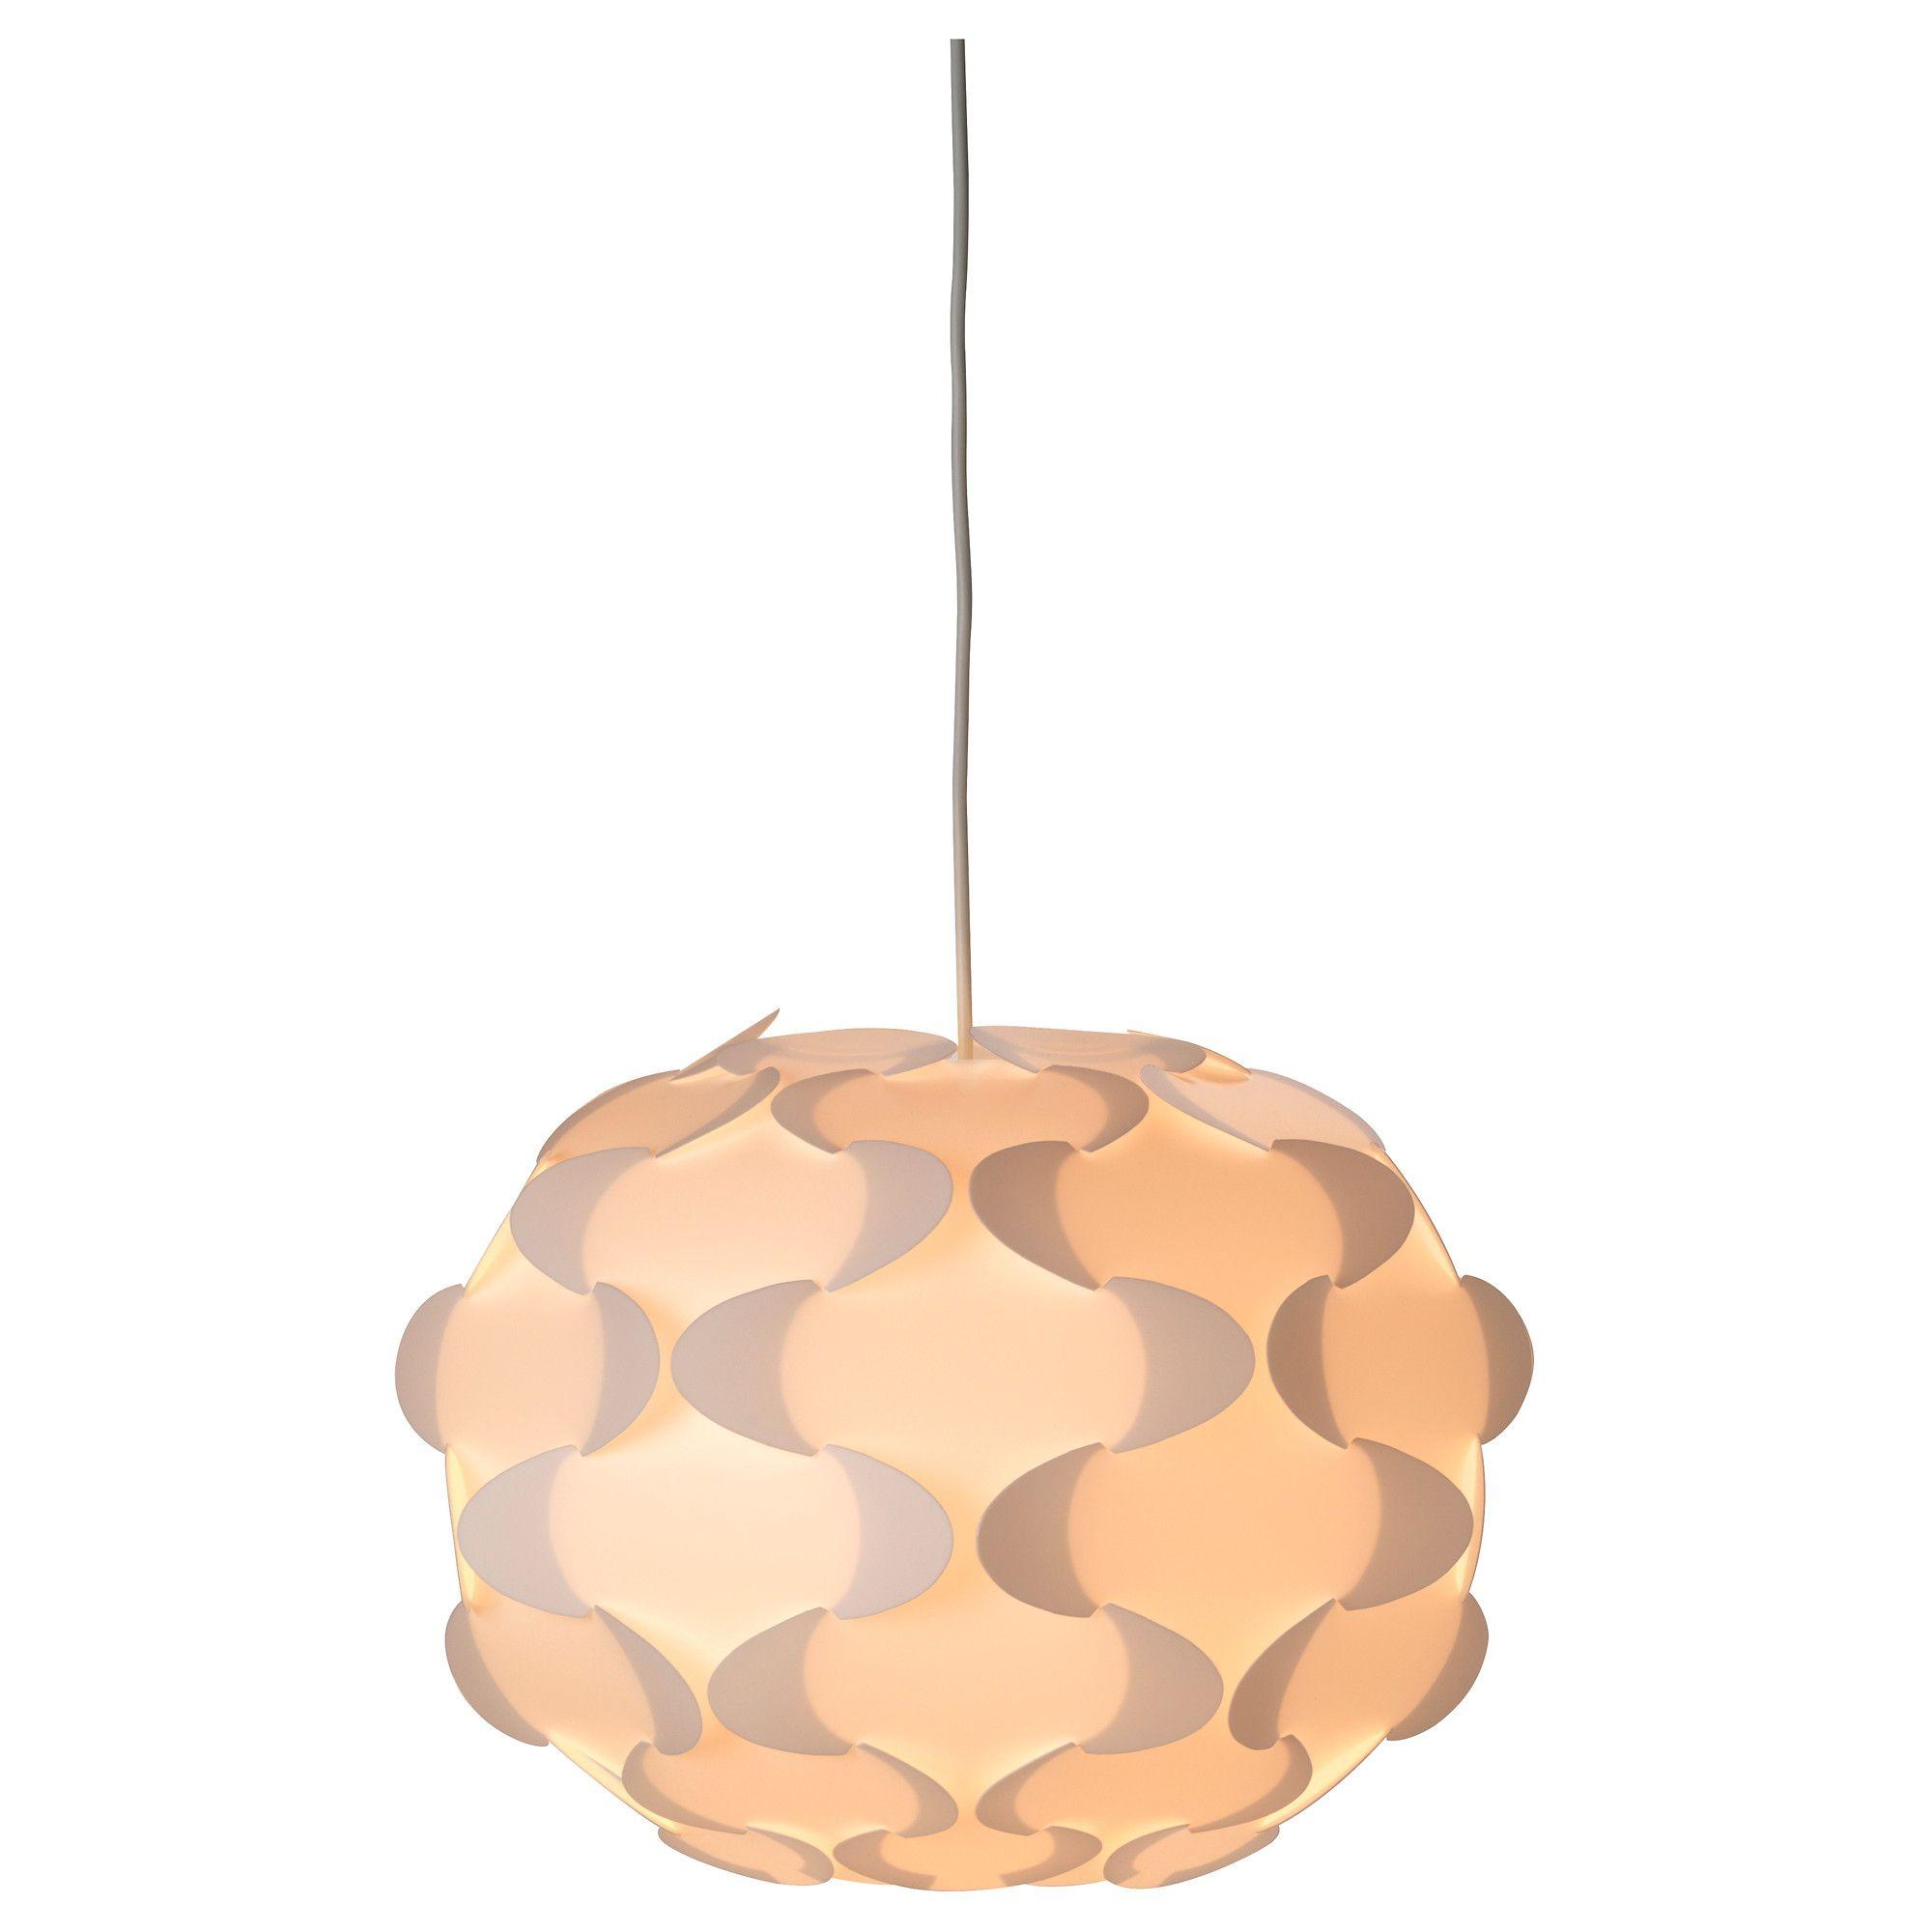 Ikea lighting pendant Light Pendant Island Kitchen Fillsta Pendant Lamp 14 Pinterest Fillsta Pendant Lamp 14